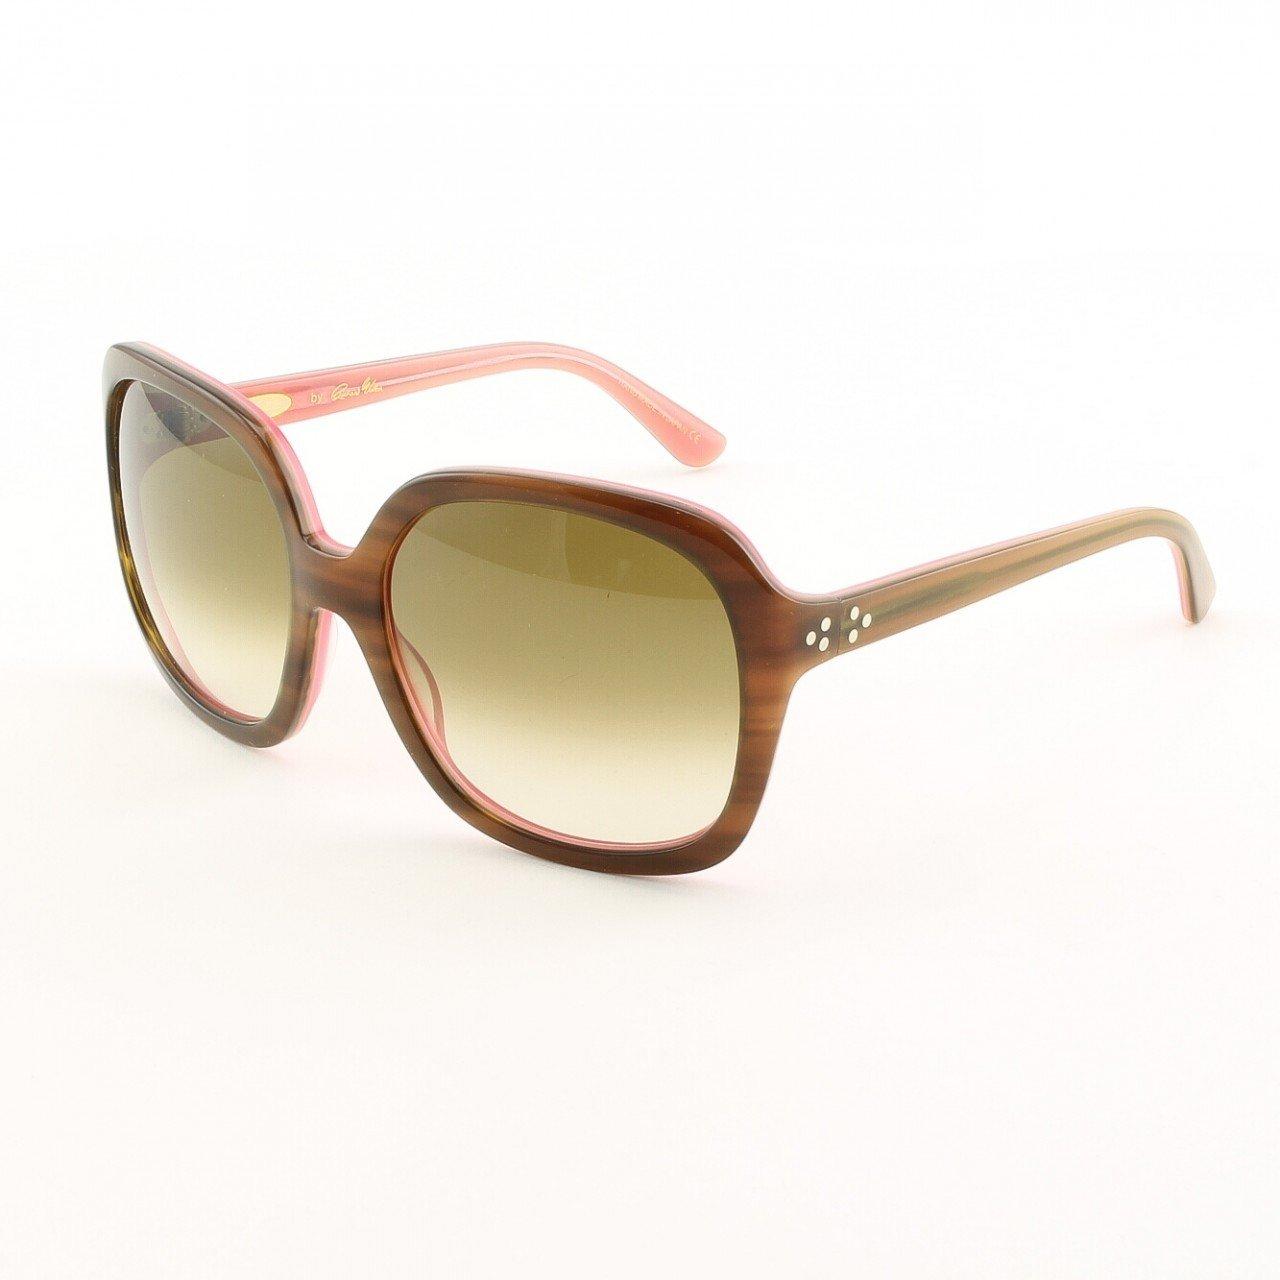 Blinde Never Had It So Good Women's Sunglasses Col. Tortoise Flamingo with Brown Gradient Lenses